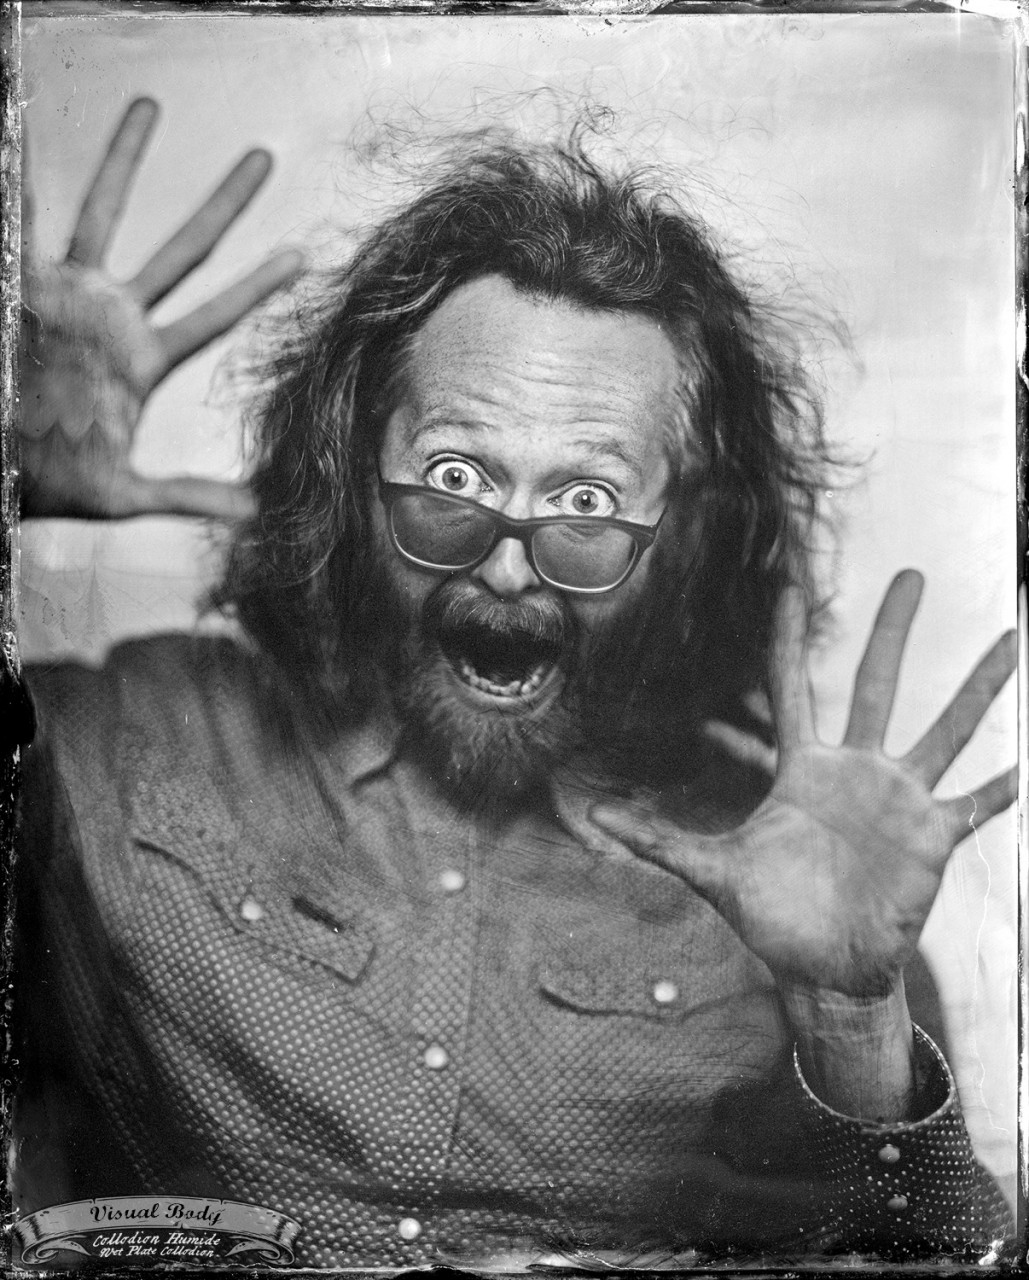 François Bellefeuille. Profession : humoriste/comedian.